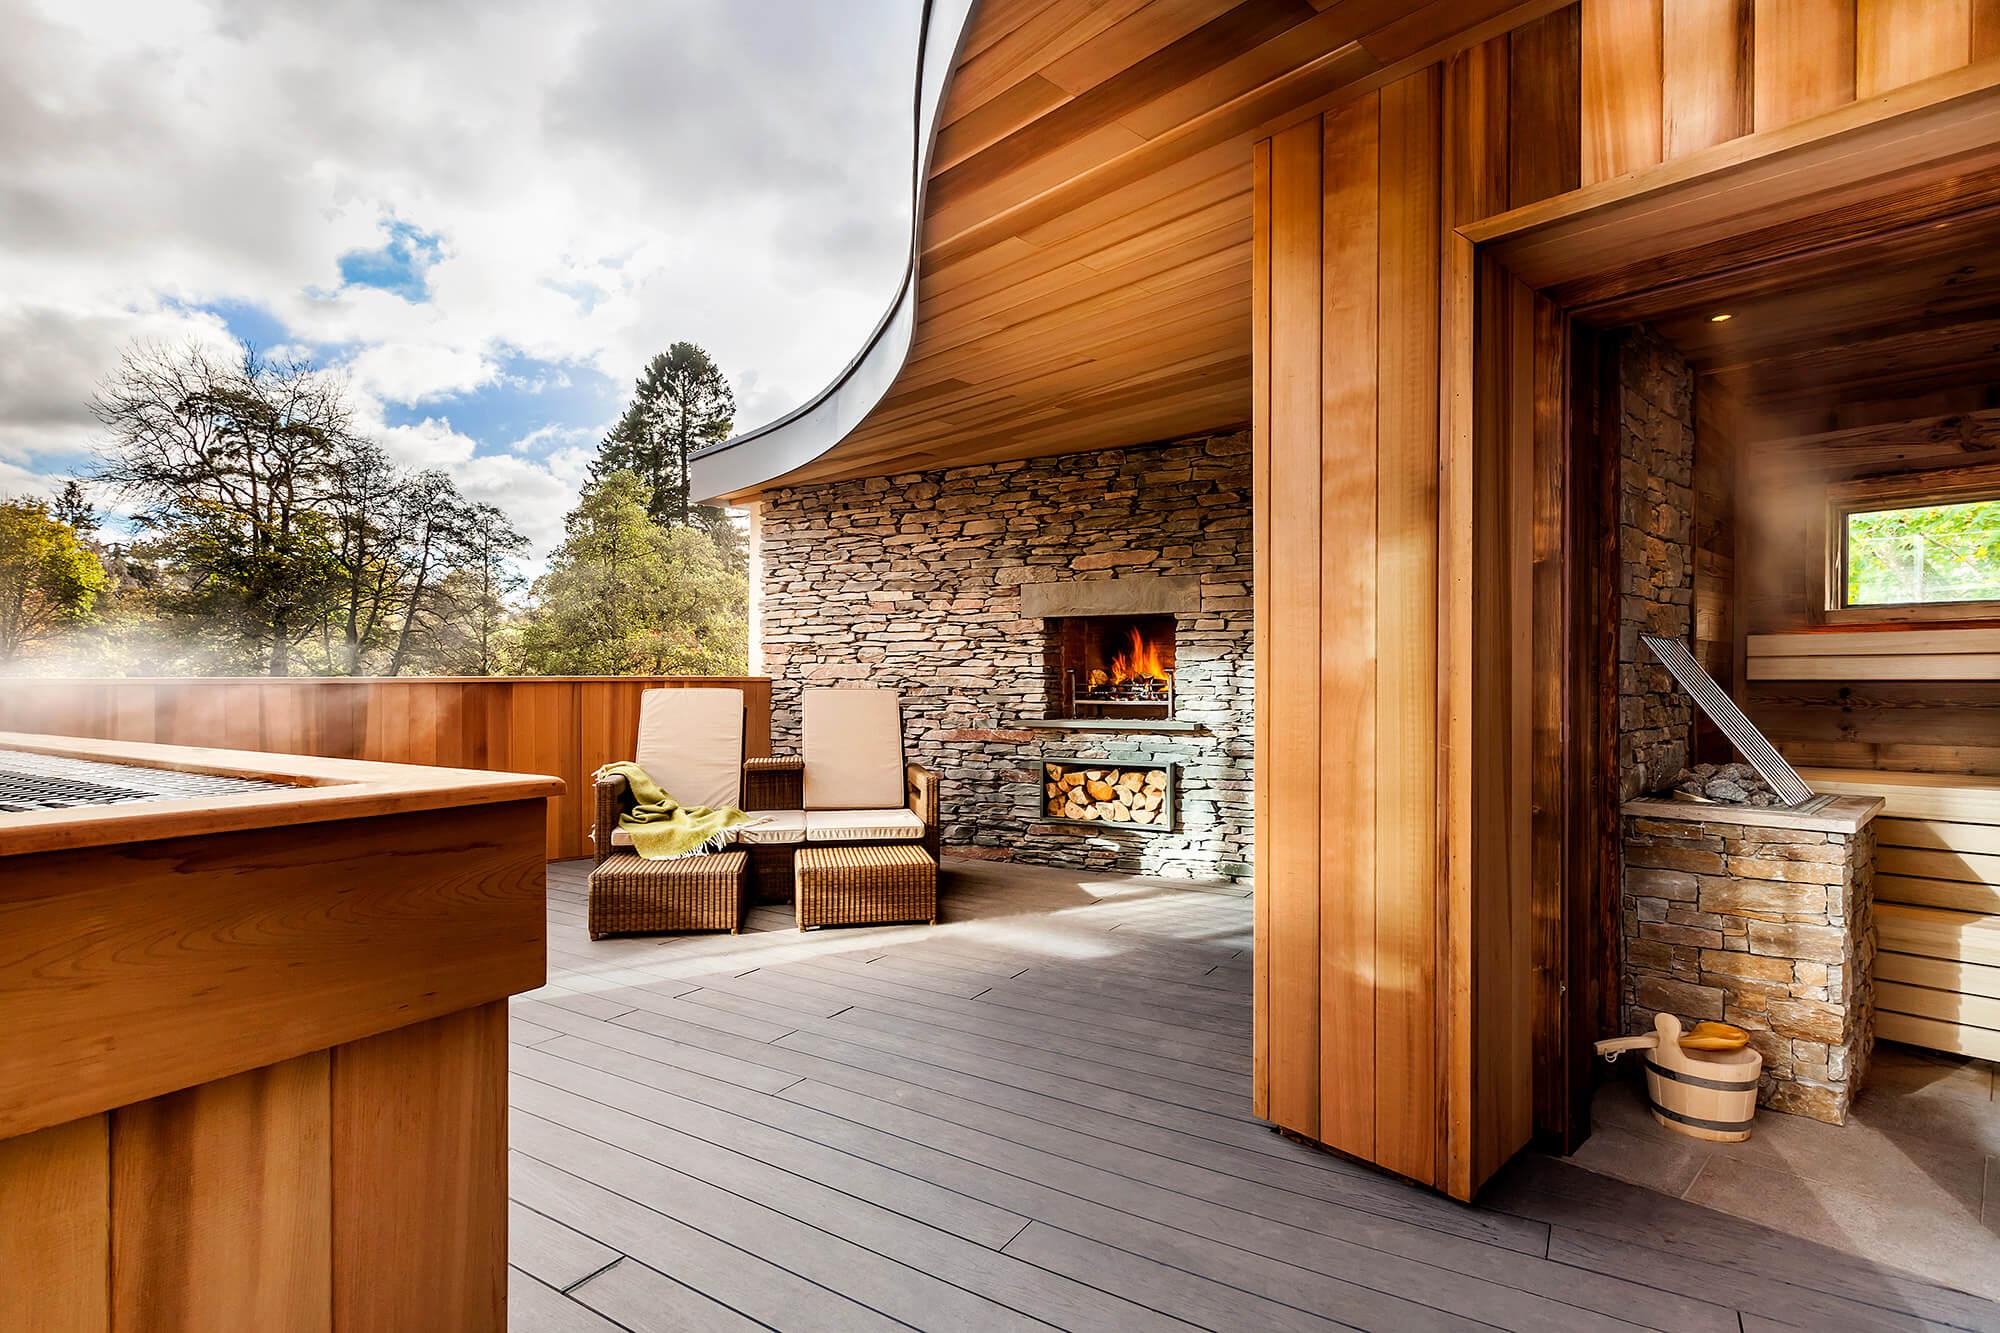 Brimstone Spa outside relaxation area